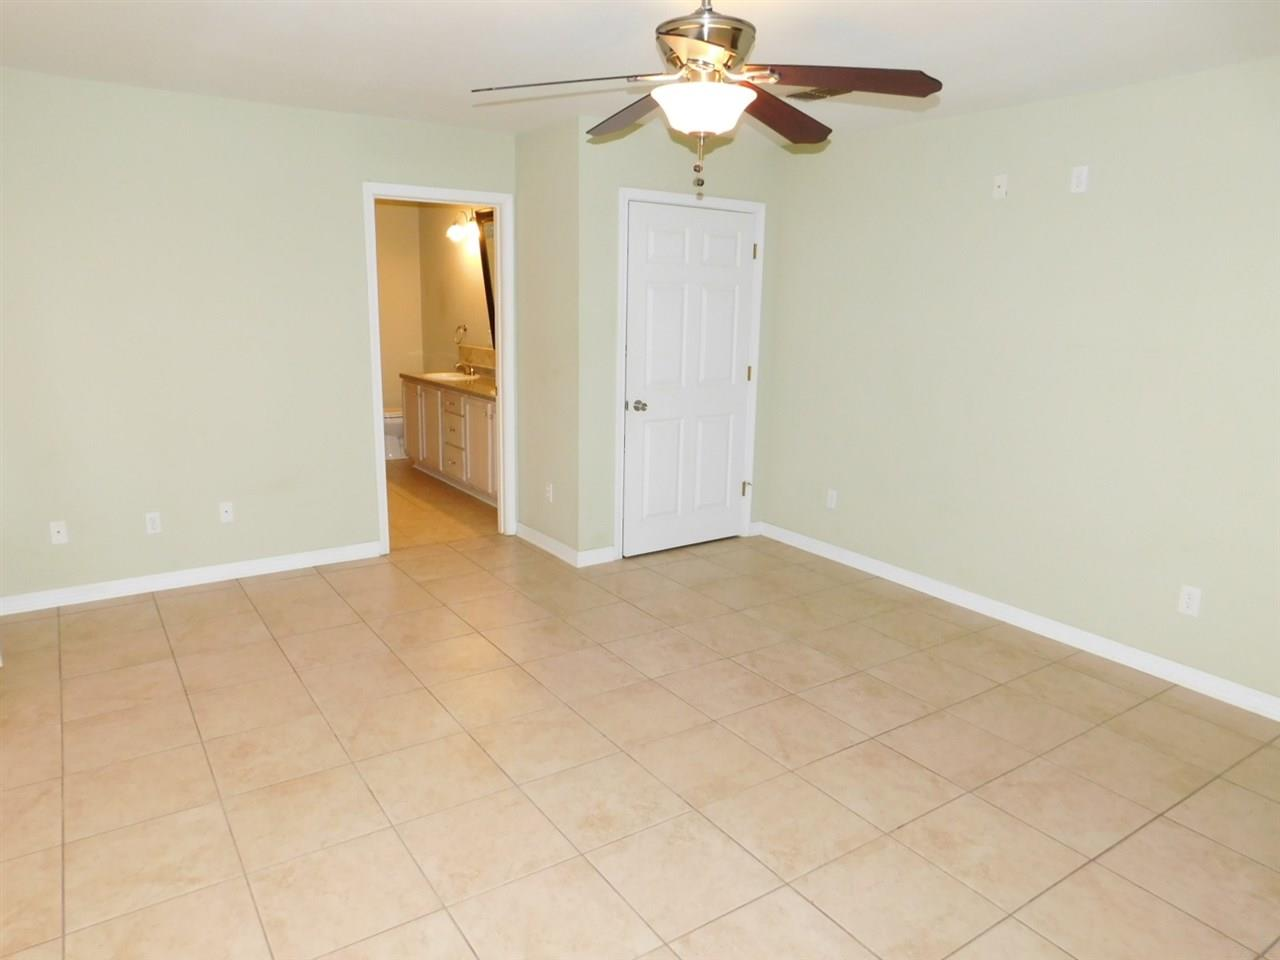 2170 Frazier St, Pensacola, FL 32514